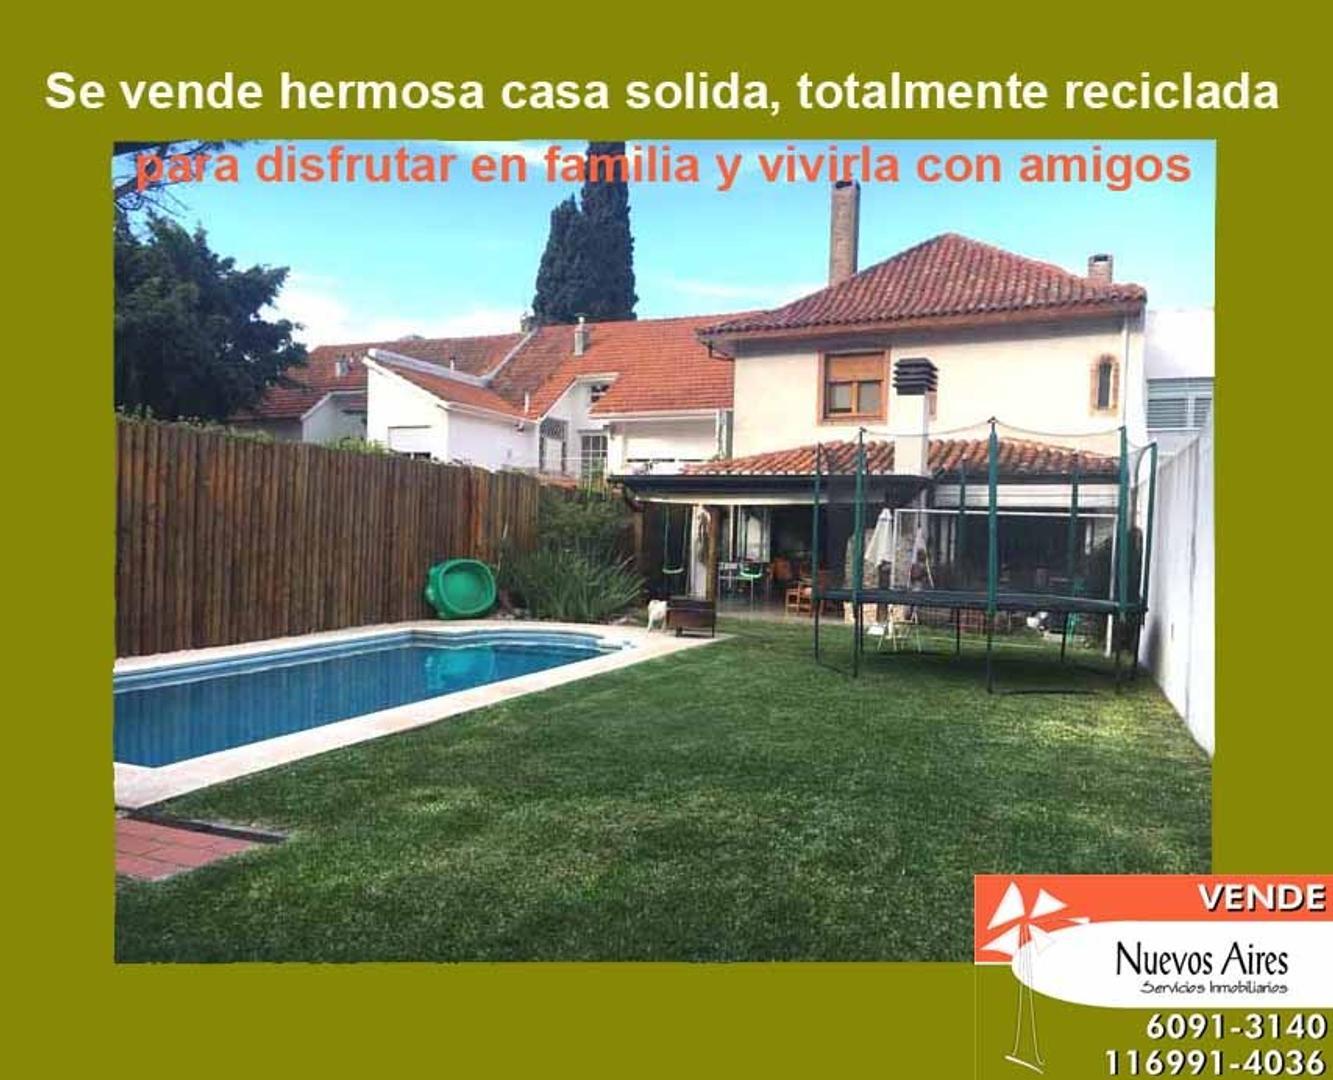 RETASADA - Casa Impecable reciclada de 5 dorm + play + cochera 2 autos + jdin  + pileta + parrilla